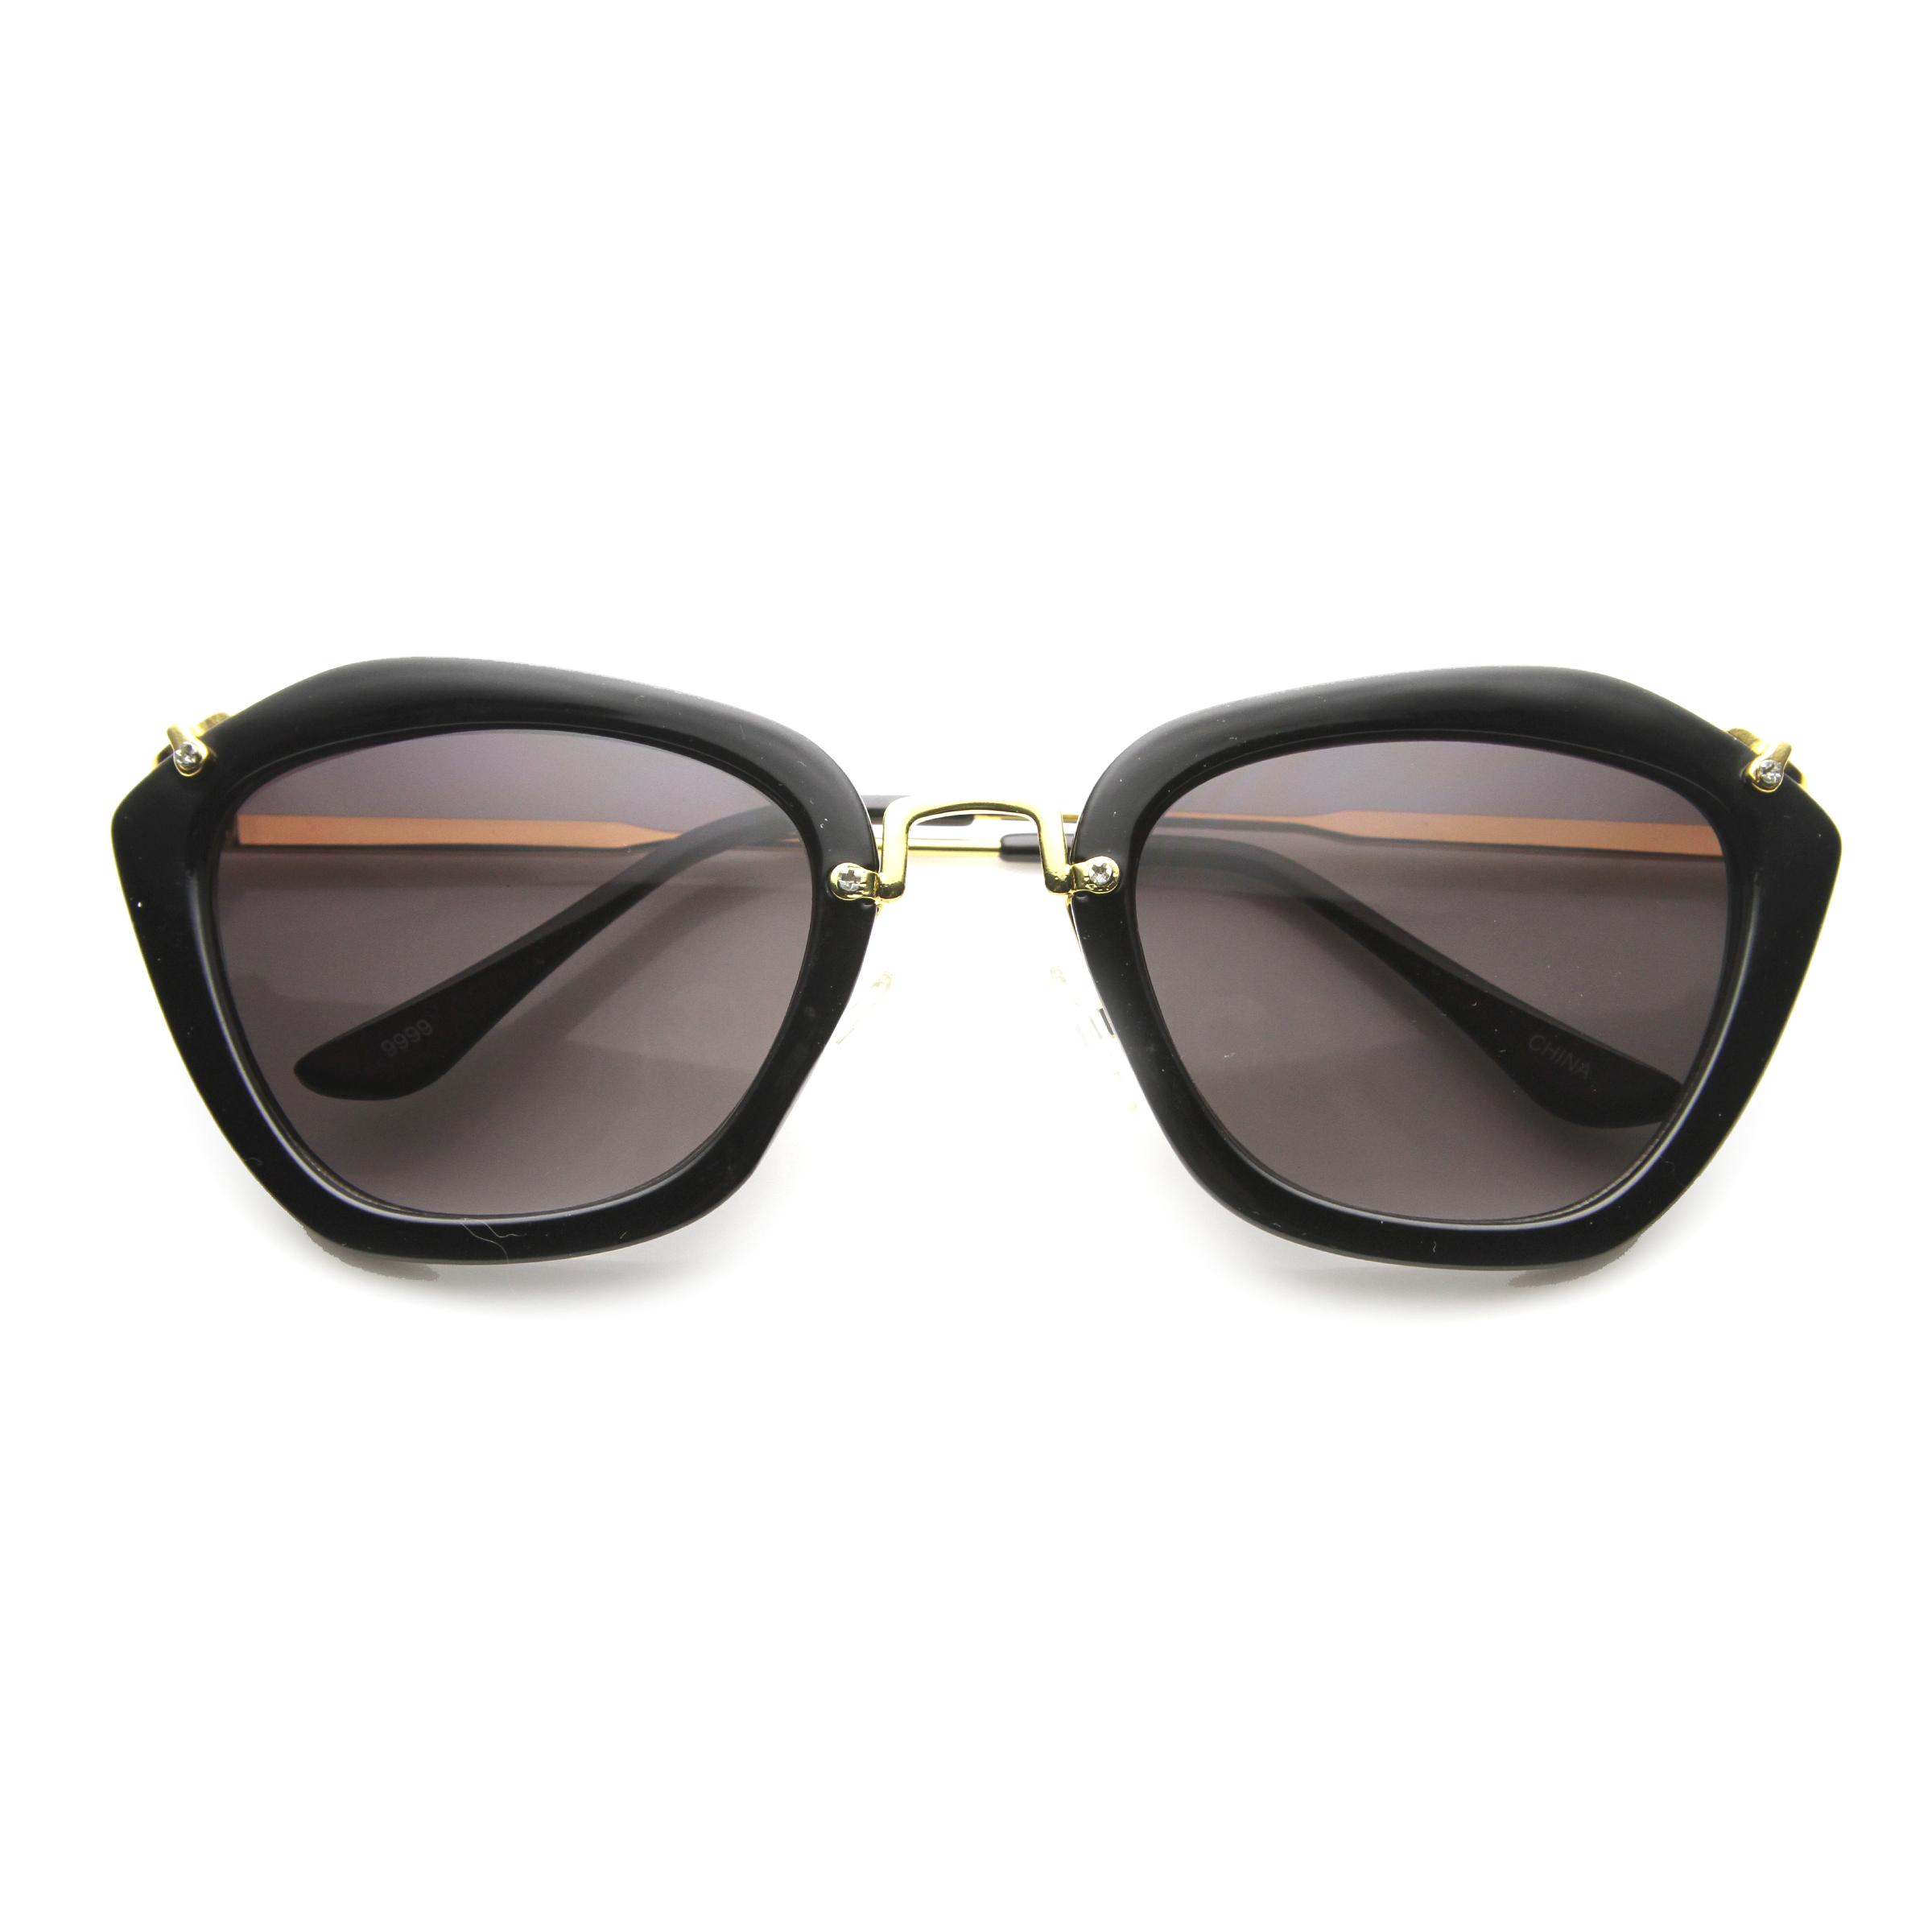 High Fashion Rounded Hexagonal Frame Metal Arm Sunglasses